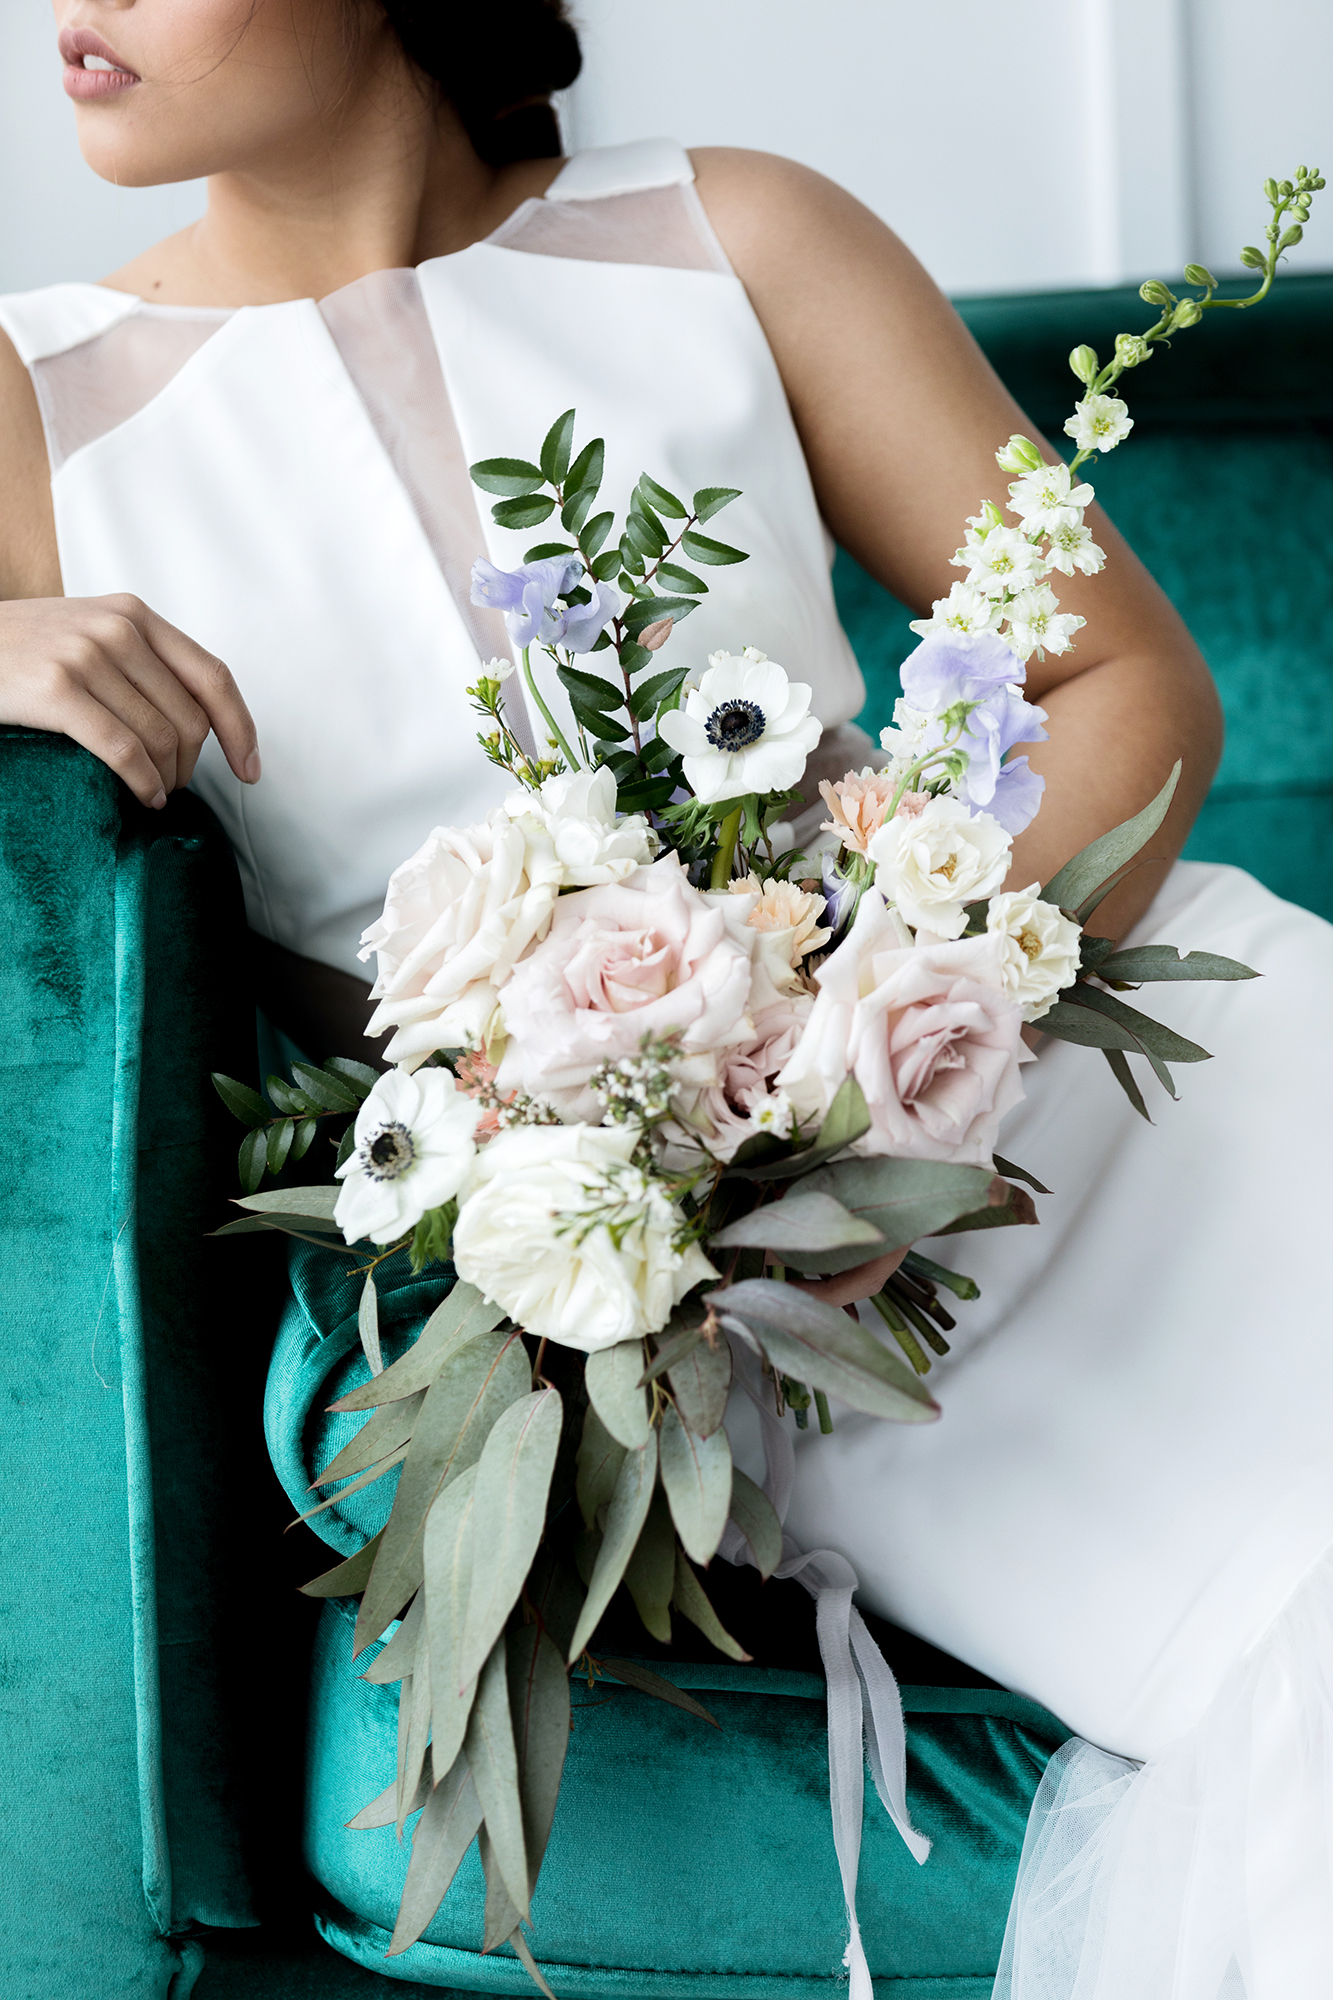 Lyons-Events-Q-Makeup-Artistry-Beautiful-Event-Rentals-Wedding